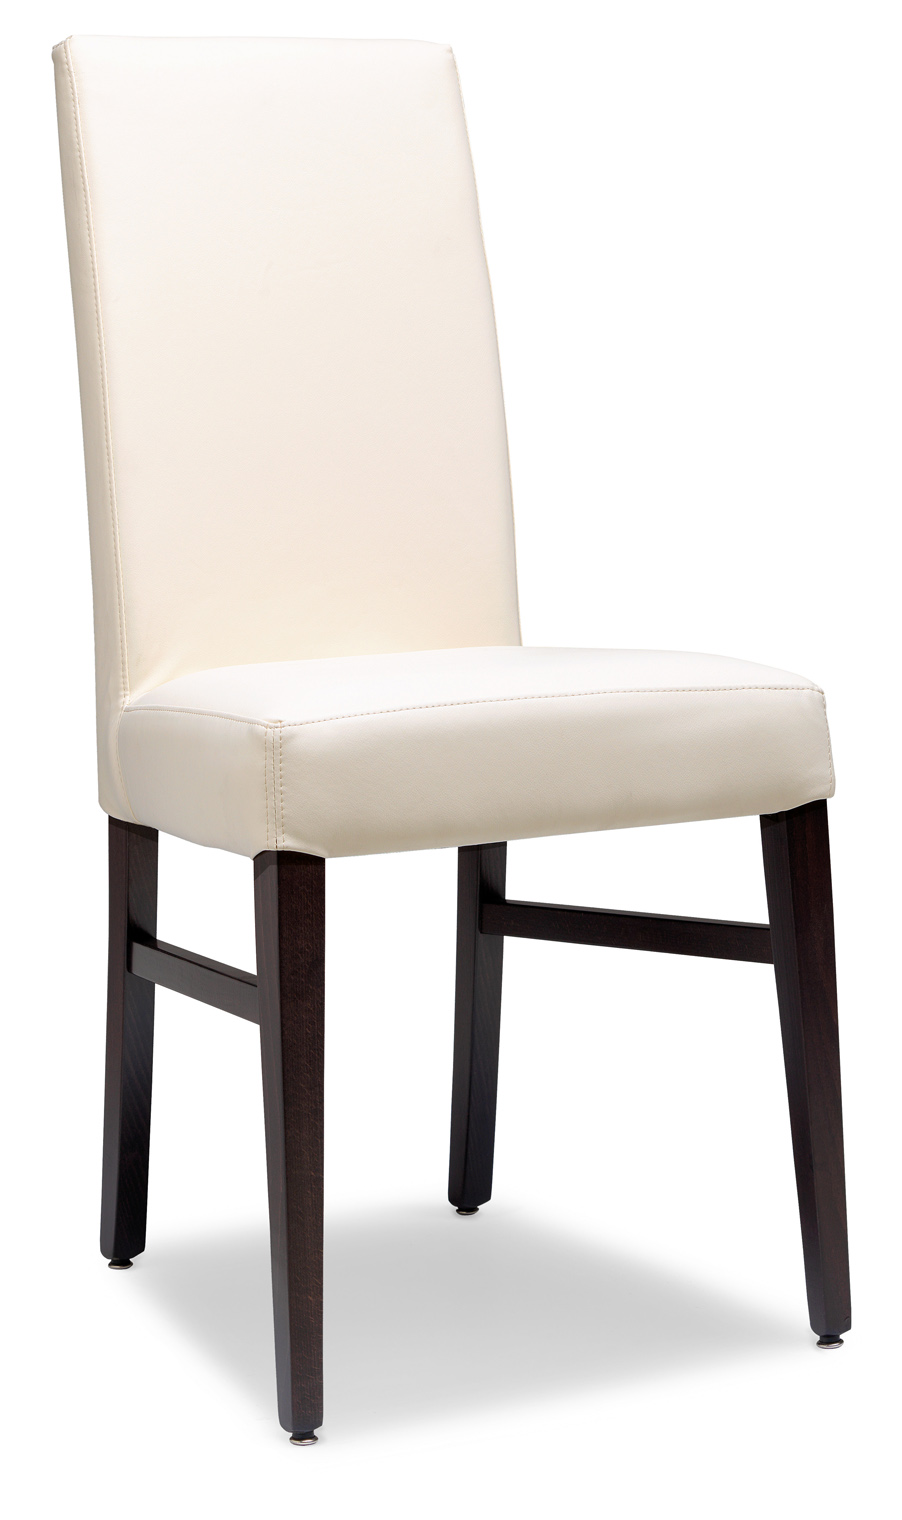 Restaurant furniture supply « hotel wholesale